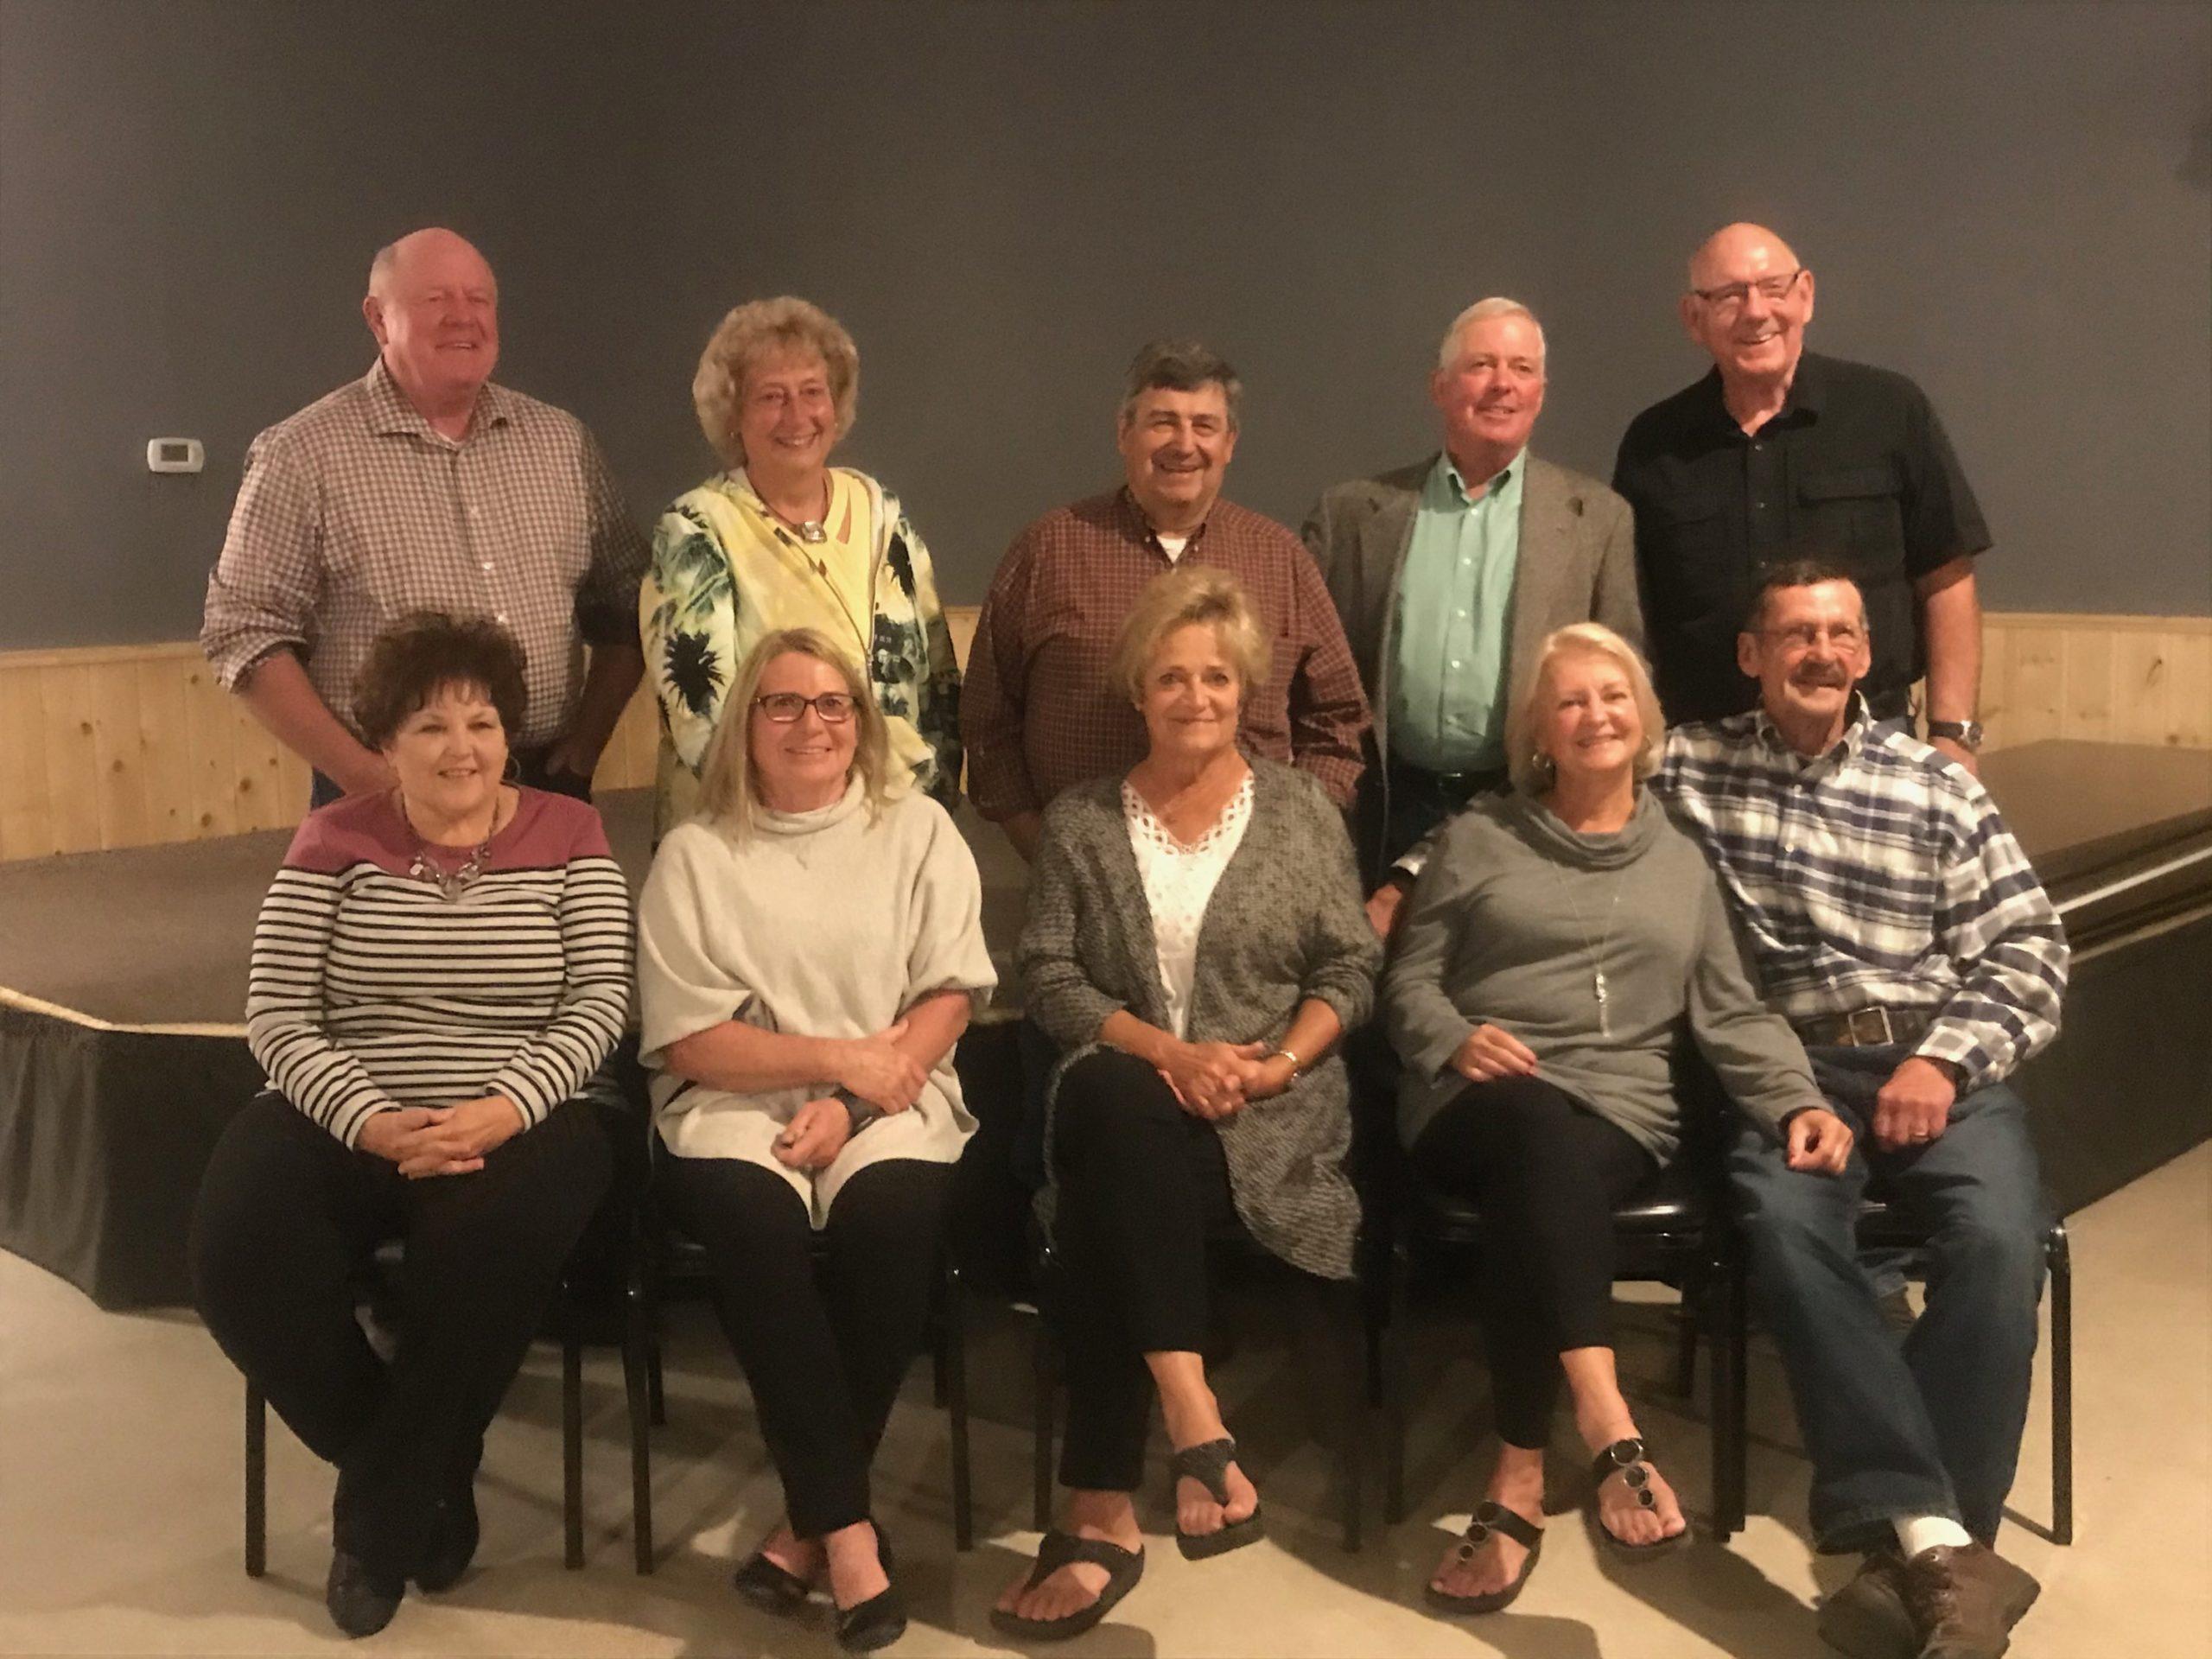 Class of 1970 celebrates 50 years | Maple Lake Messenger